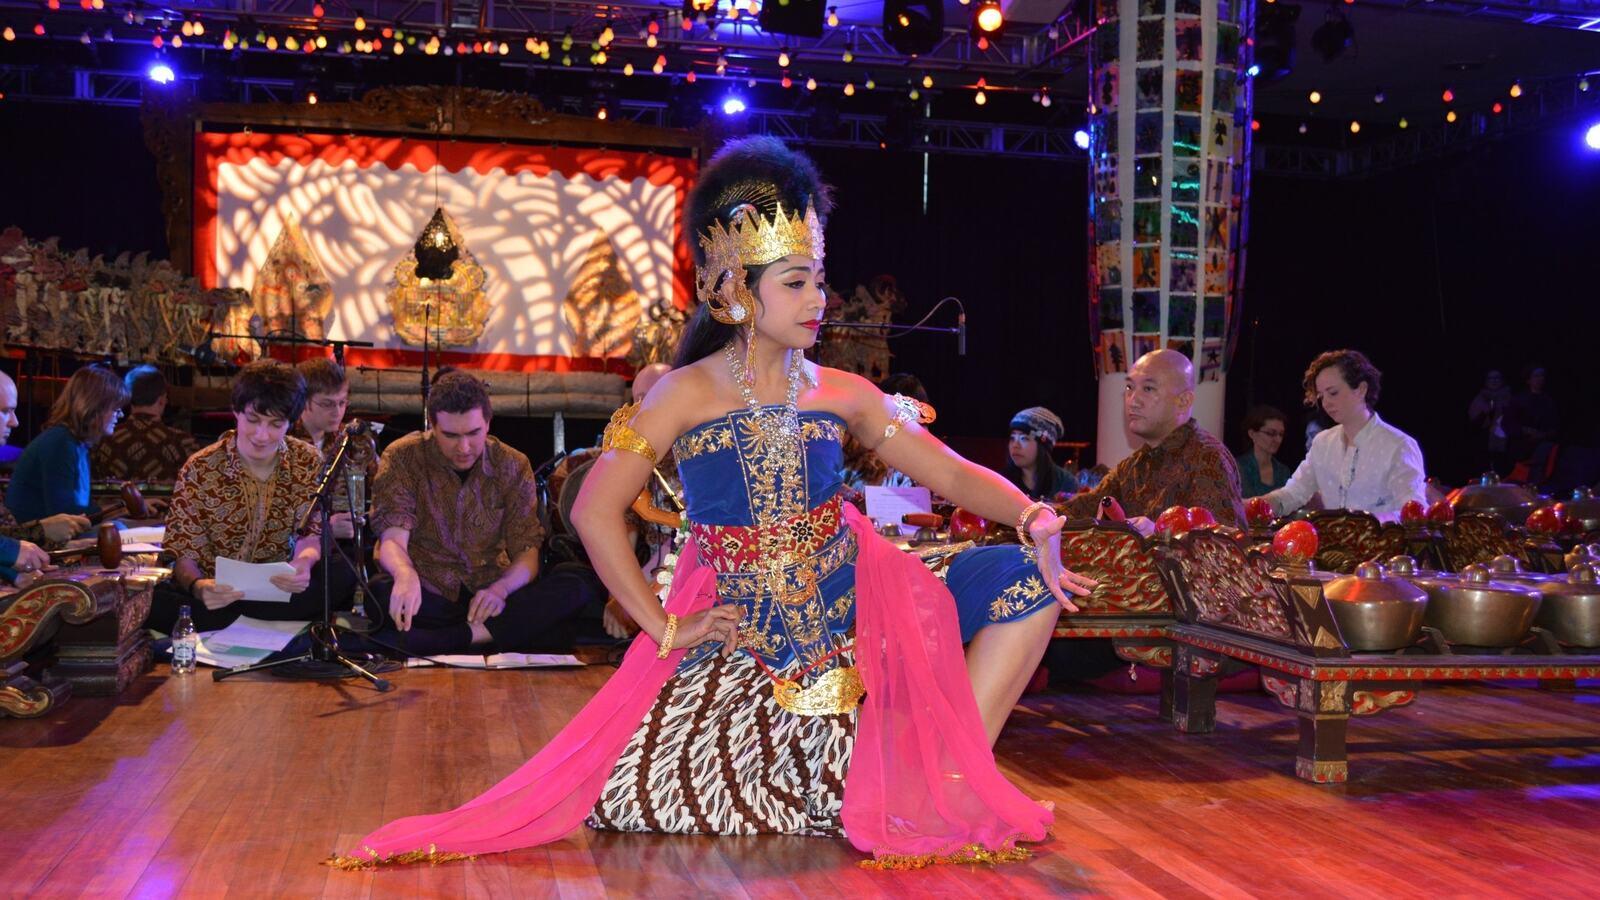 Gamelan Dancer at the Royal Festival Hall